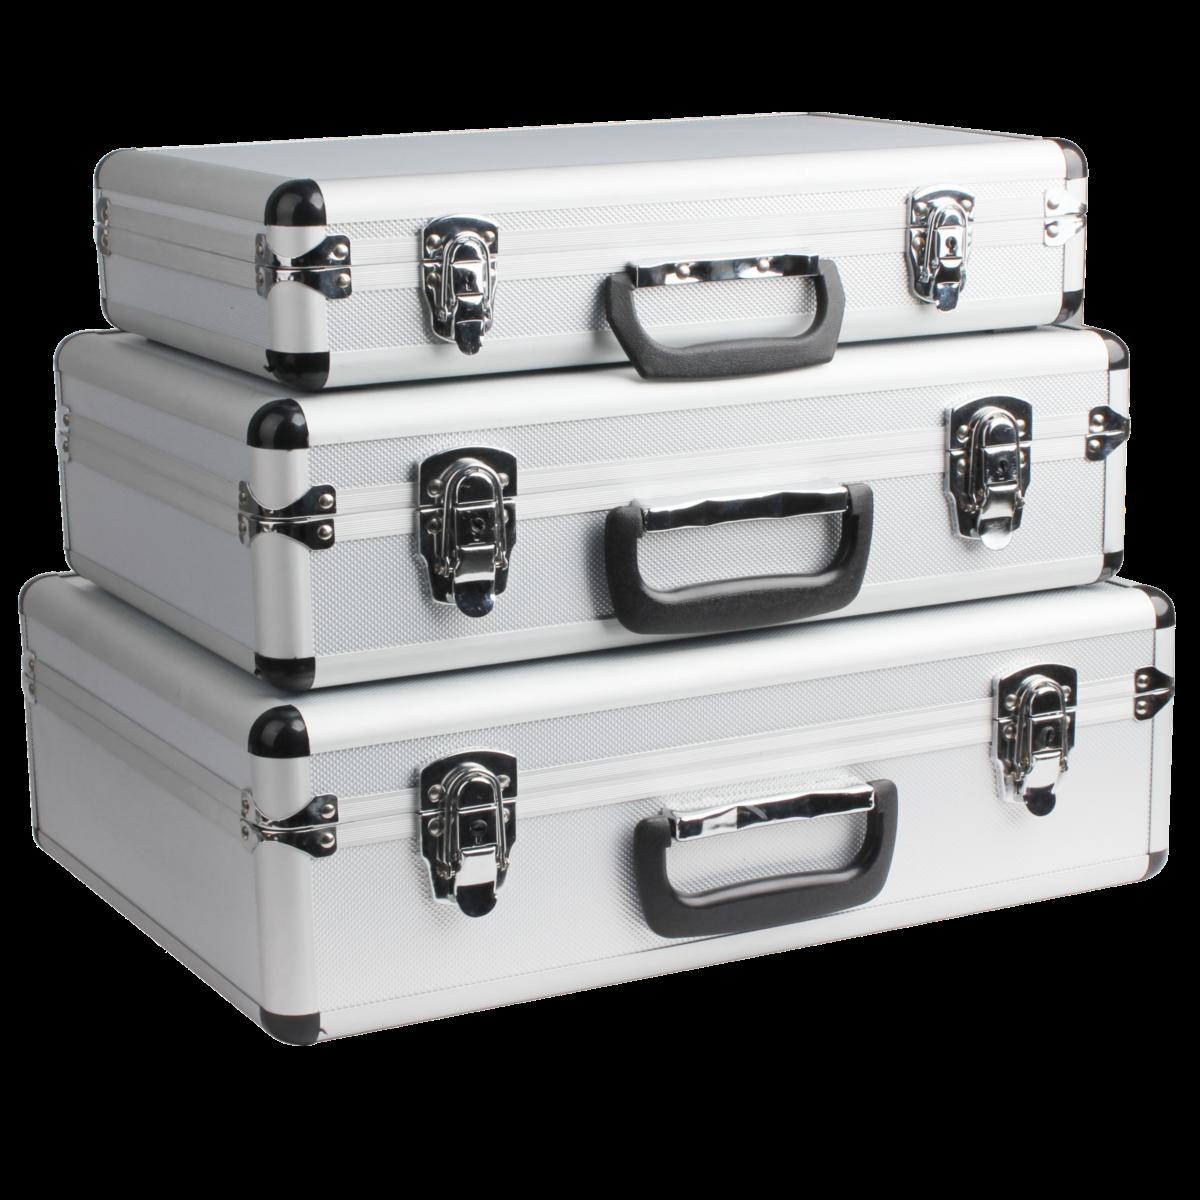 alu szersz mtart koffer szett 3 r szes koffer t rol s. Black Bedroom Furniture Sets. Home Design Ideas